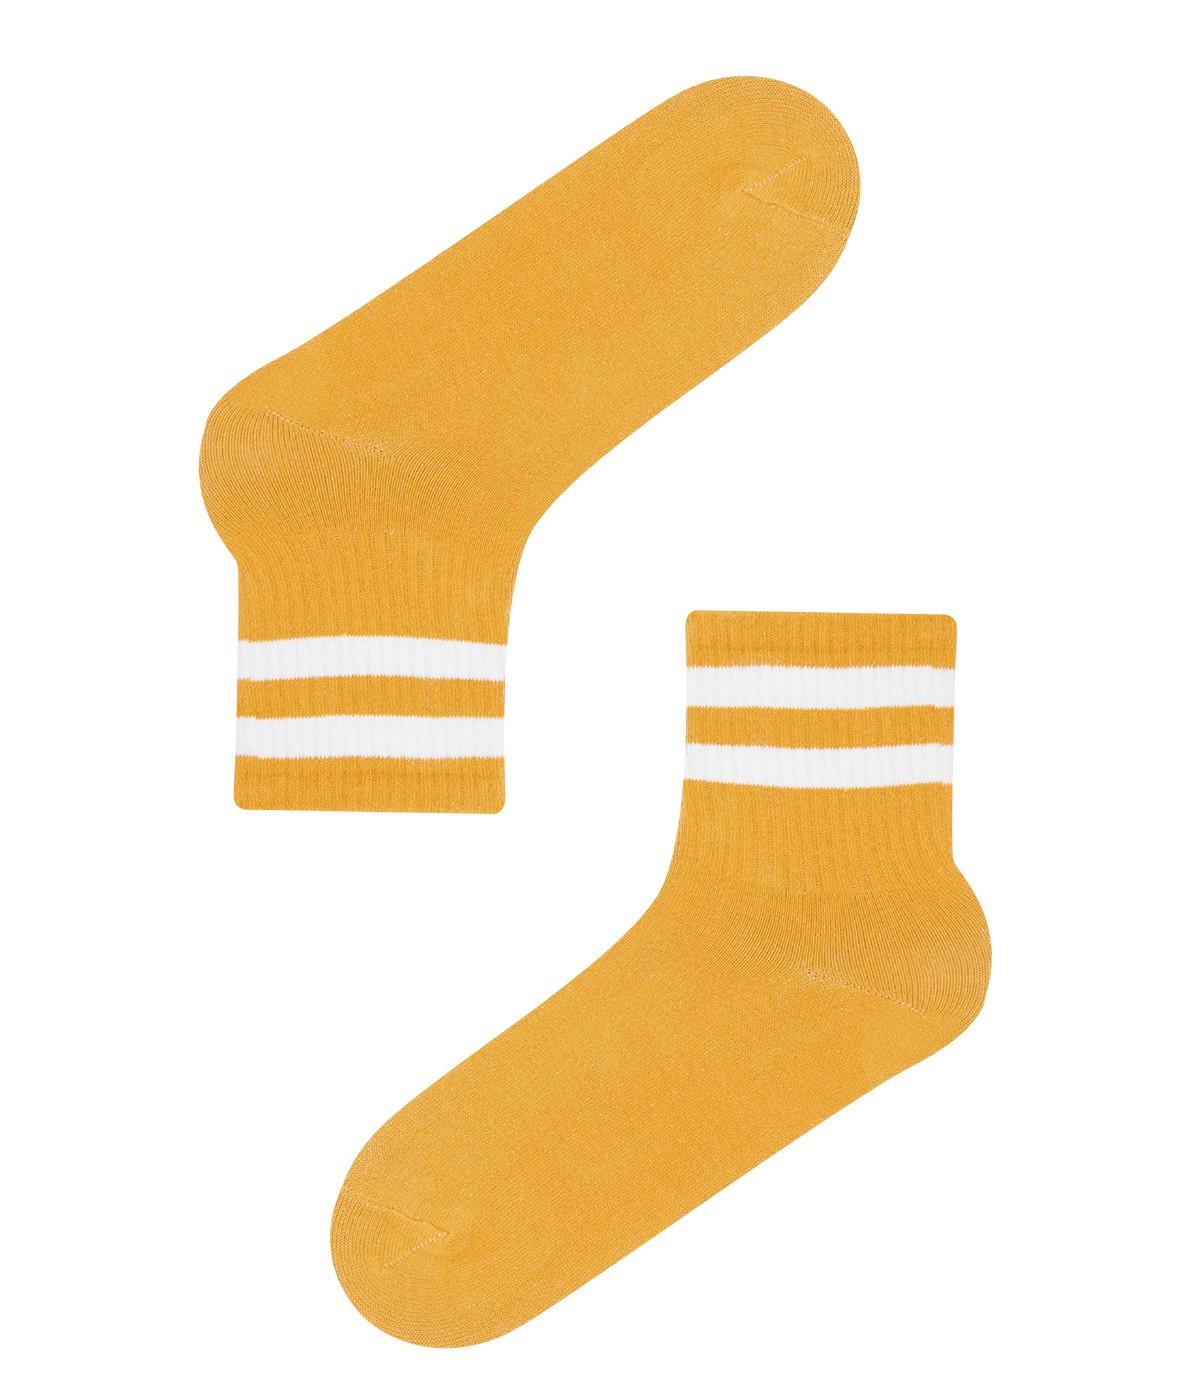 Cool Calf Socks